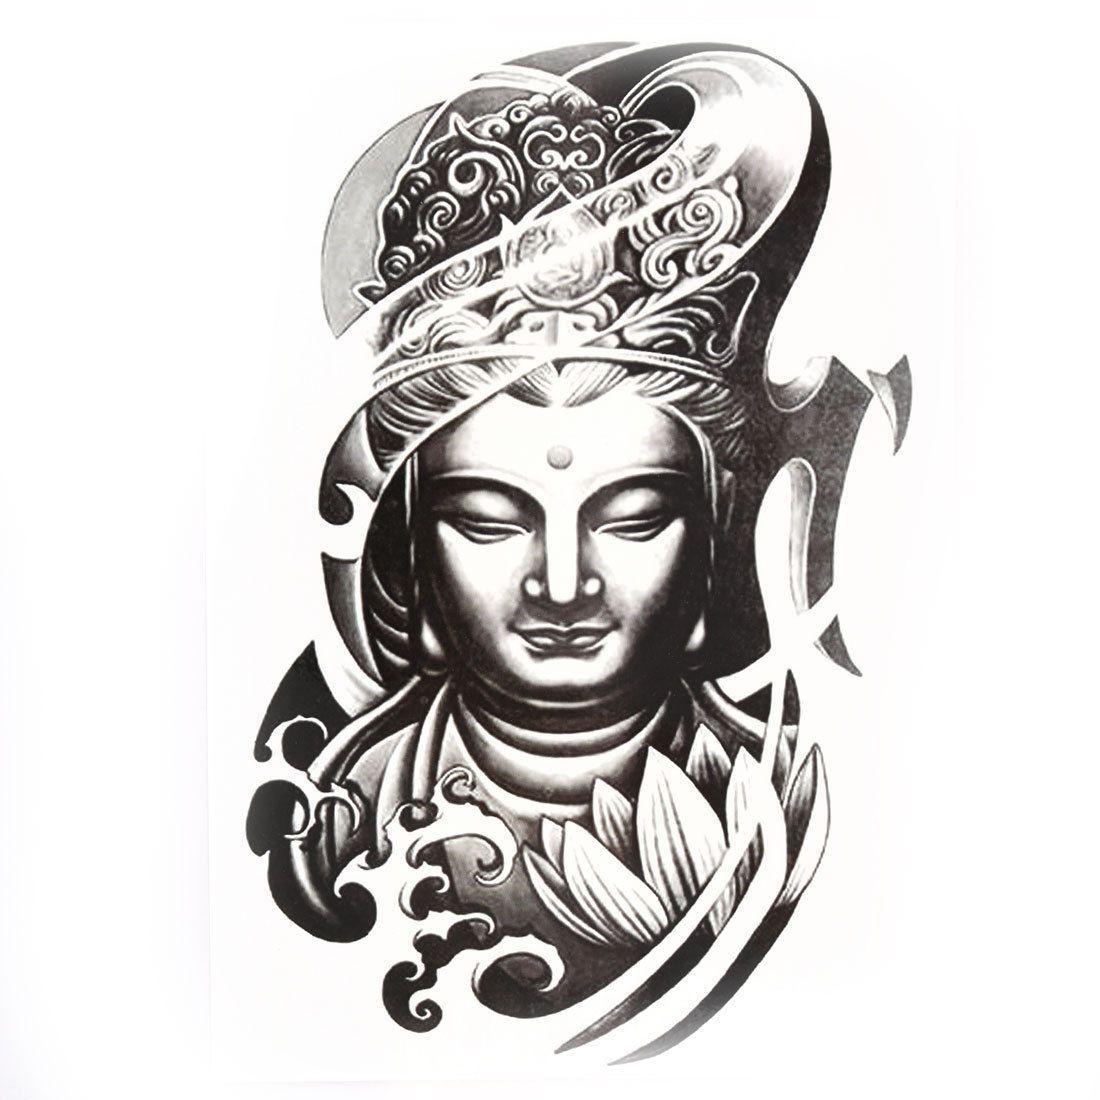 Da da danielle colby cushman tattoos - Body Art Buddha Pattern Removable Decor Paper Sticker Decal Temporary Tattoo